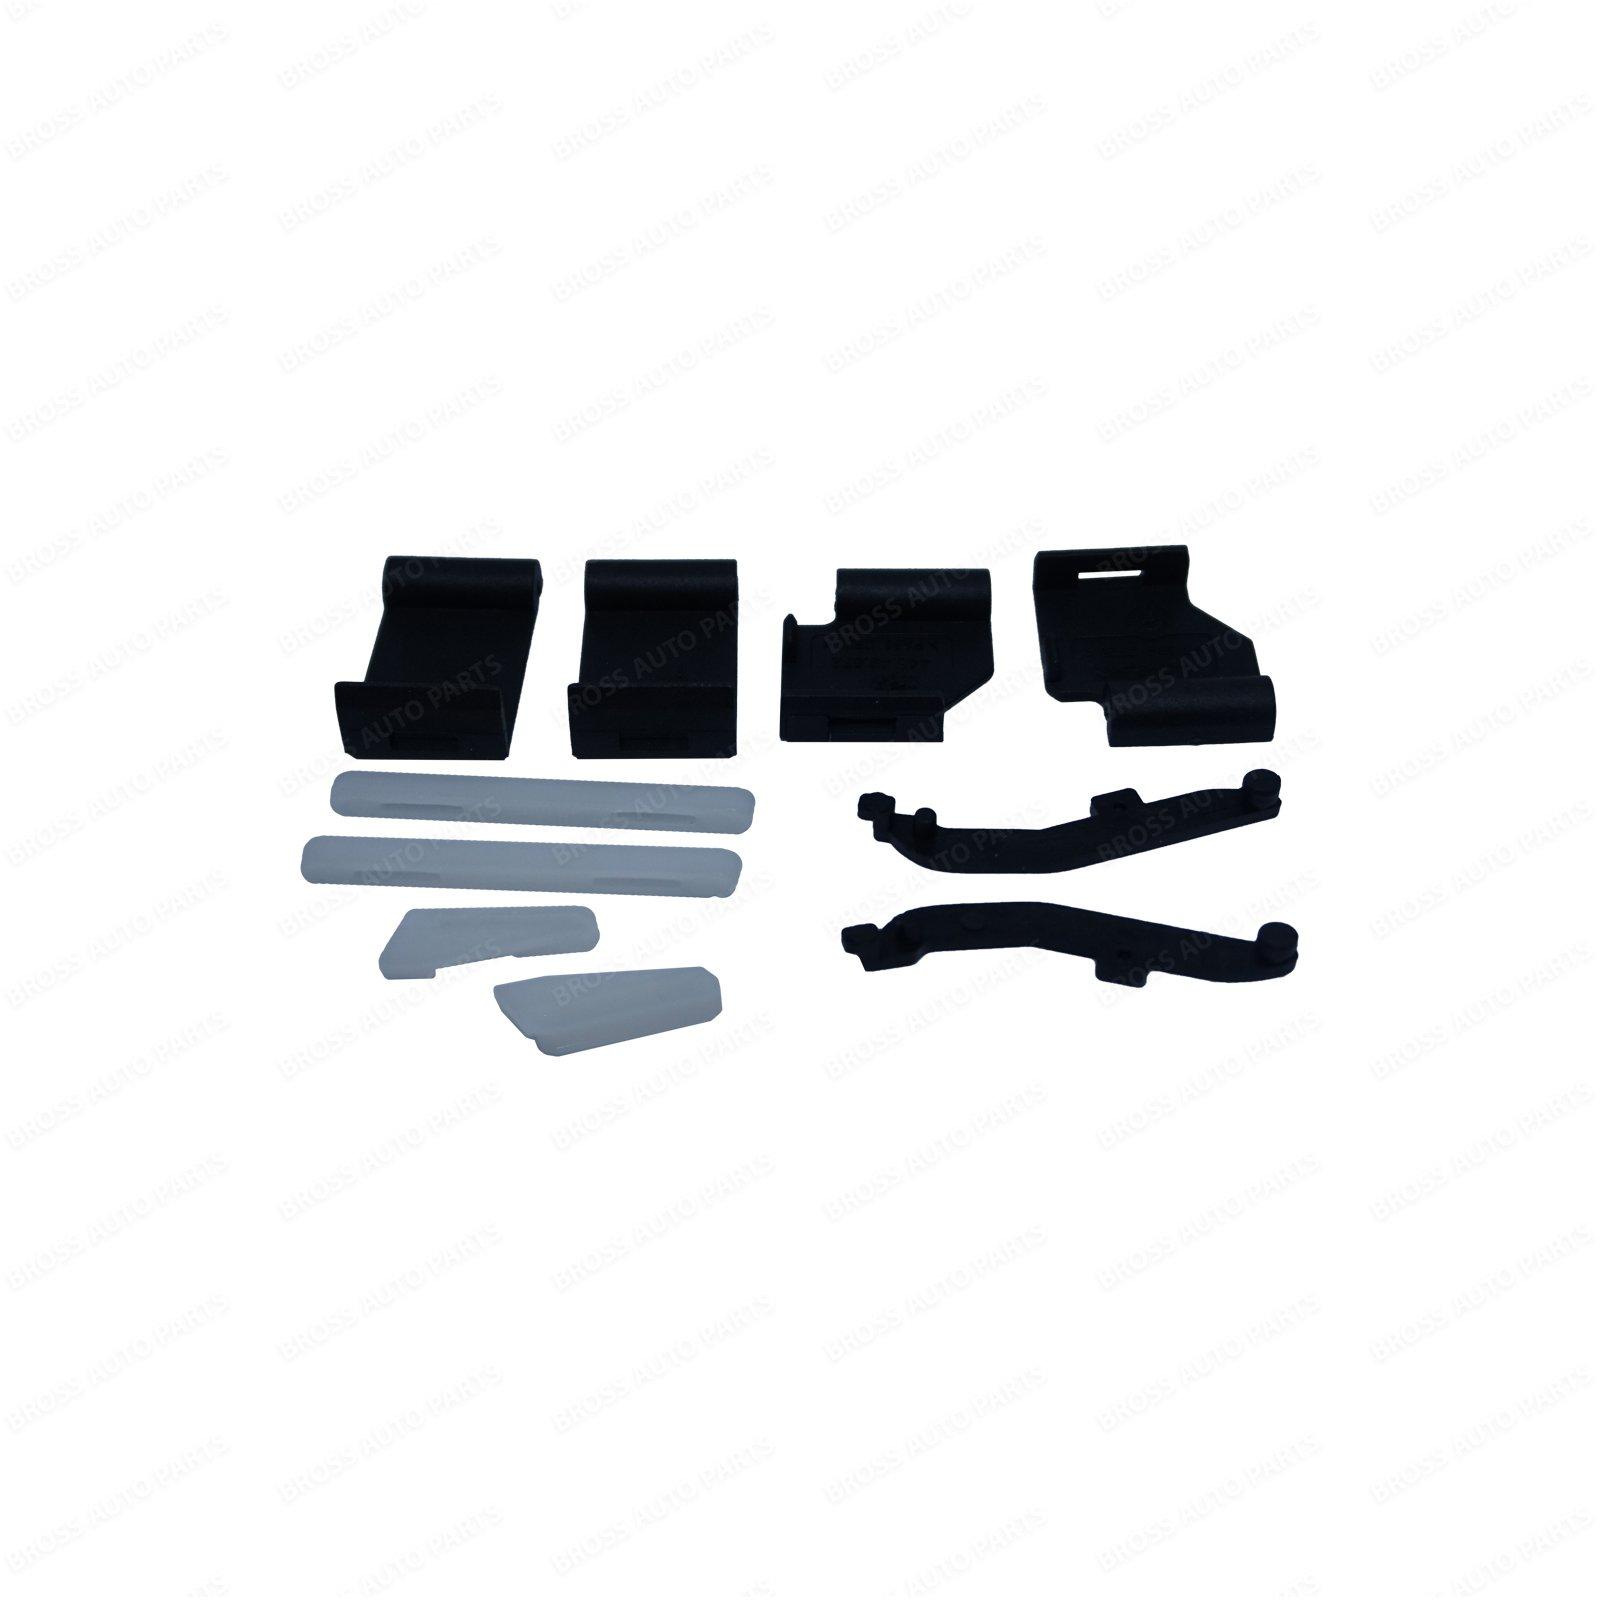 PANORAMIC SUNROOF REPAIR KIT FOR BMW X5 E53 X3 E83 GUIDE RAIL KIT LEFT RIGHT